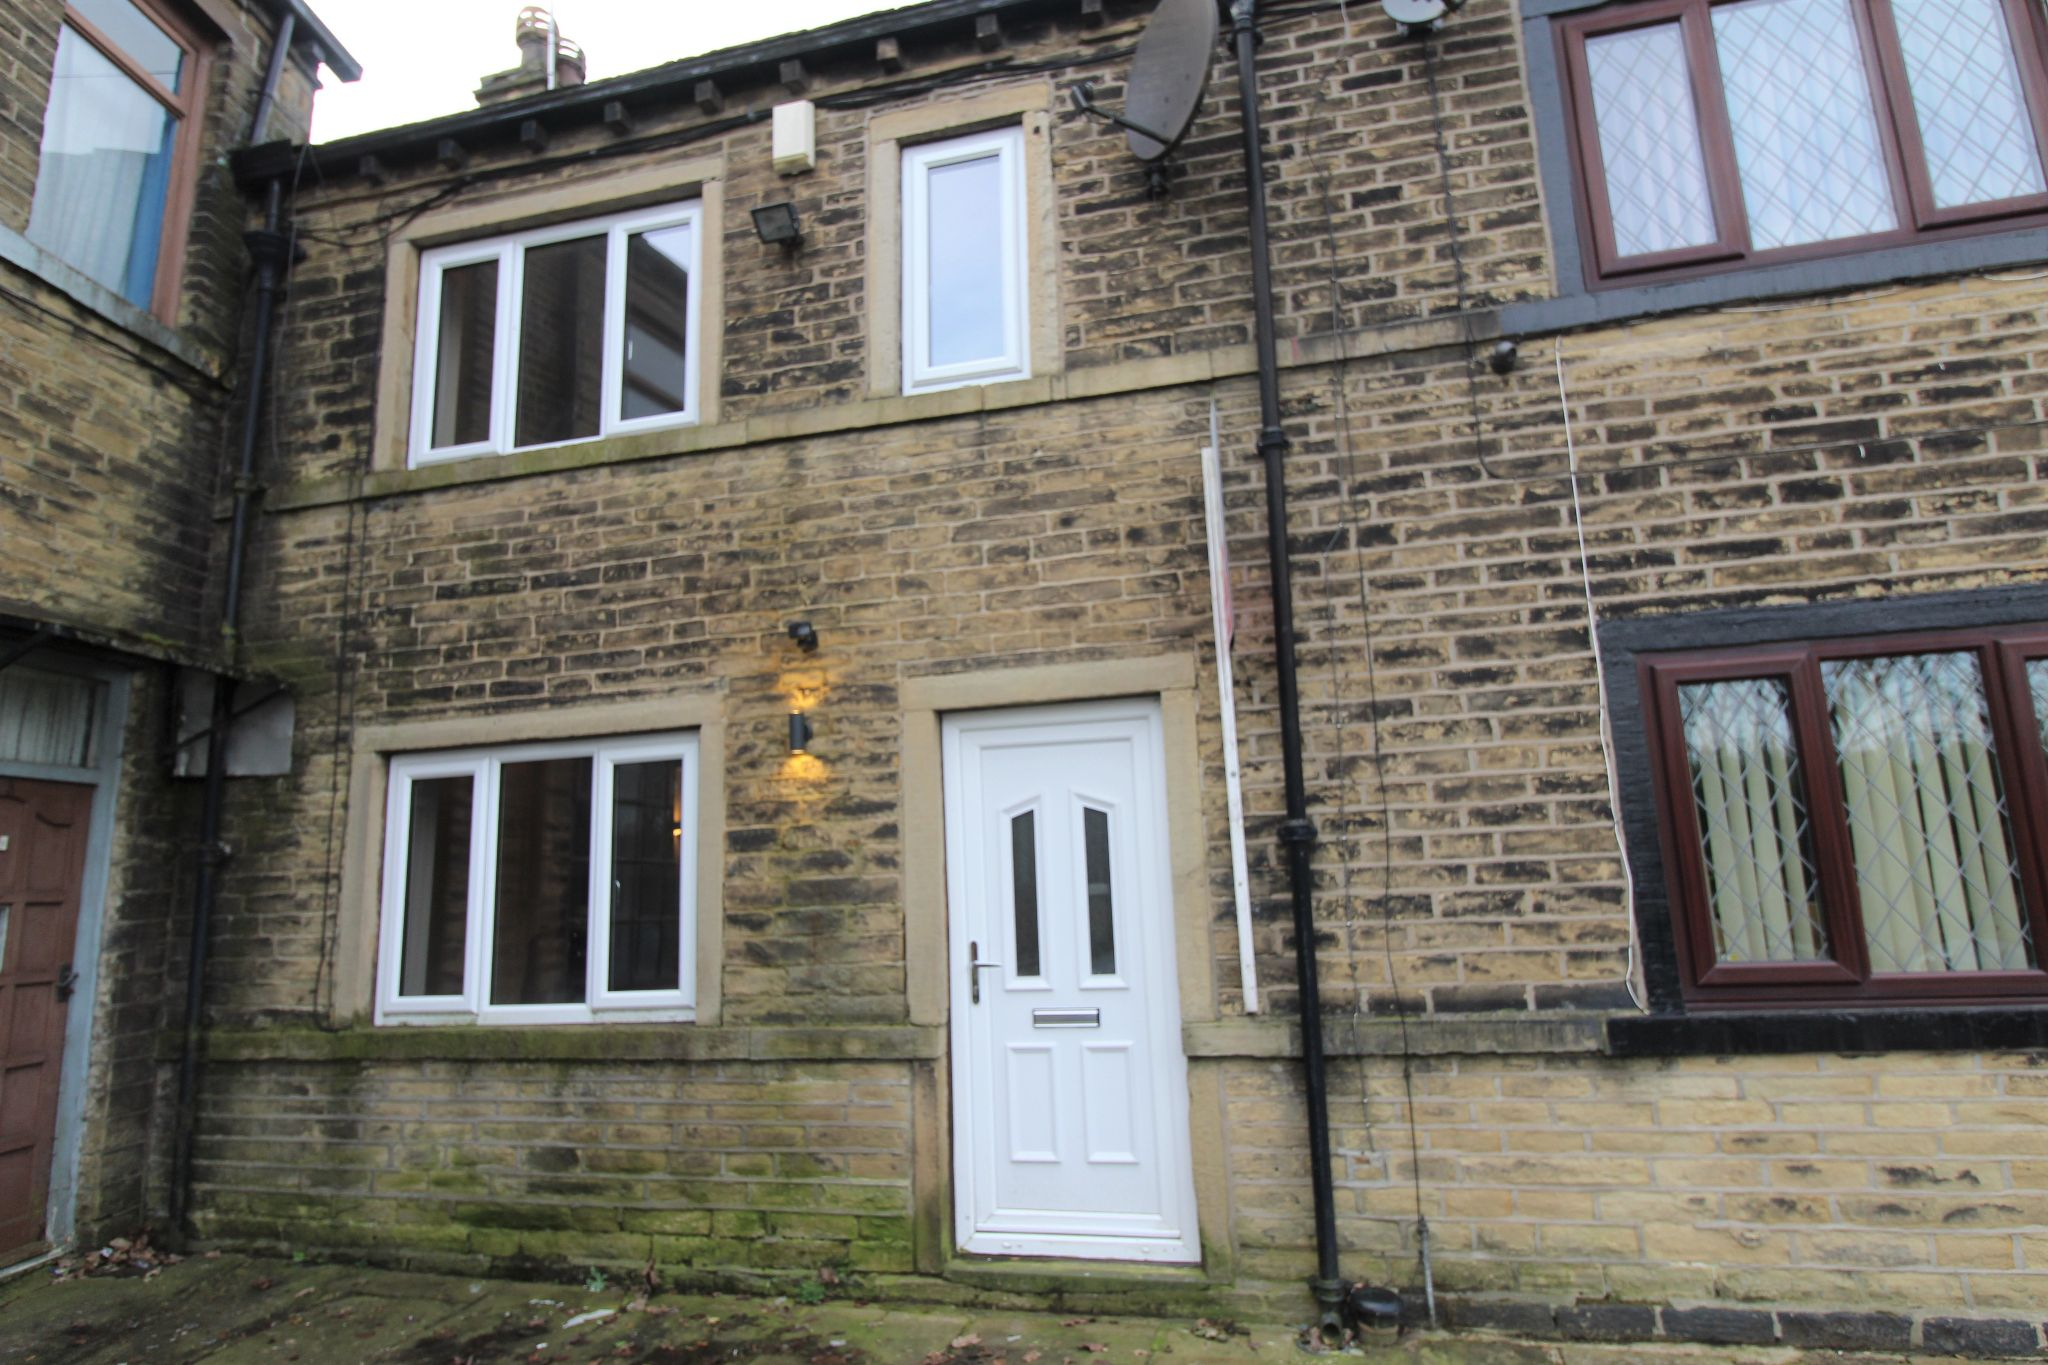 1 bedroom cottage house Let in Bradford - Front aspect